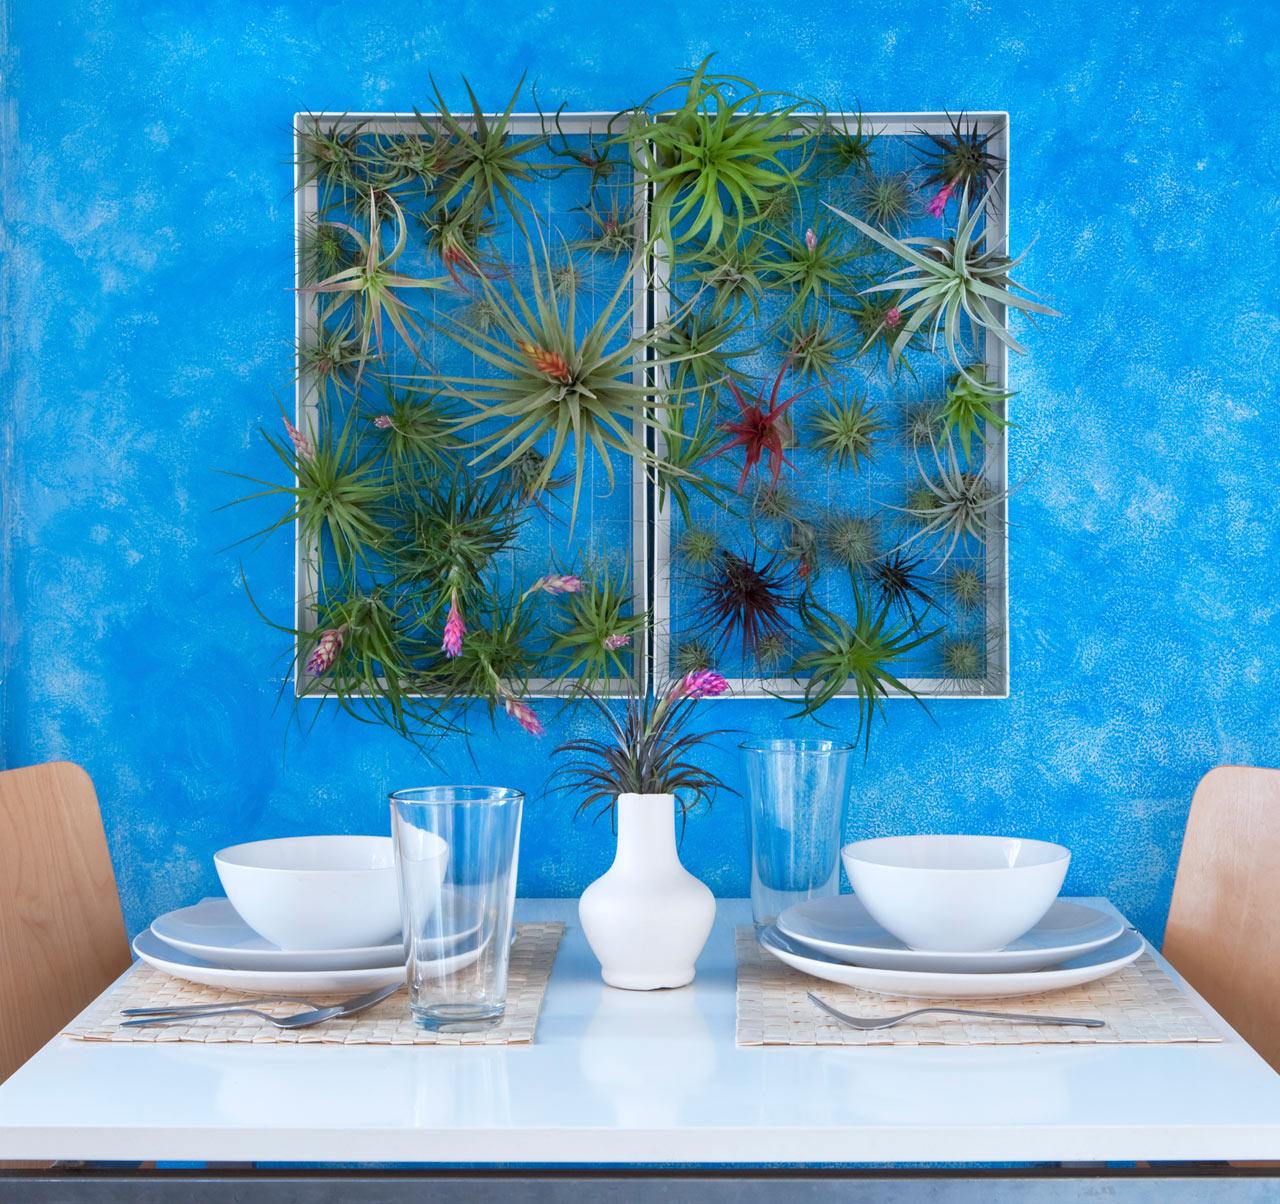 outdoor-wall-decor-ideas-frame-plants